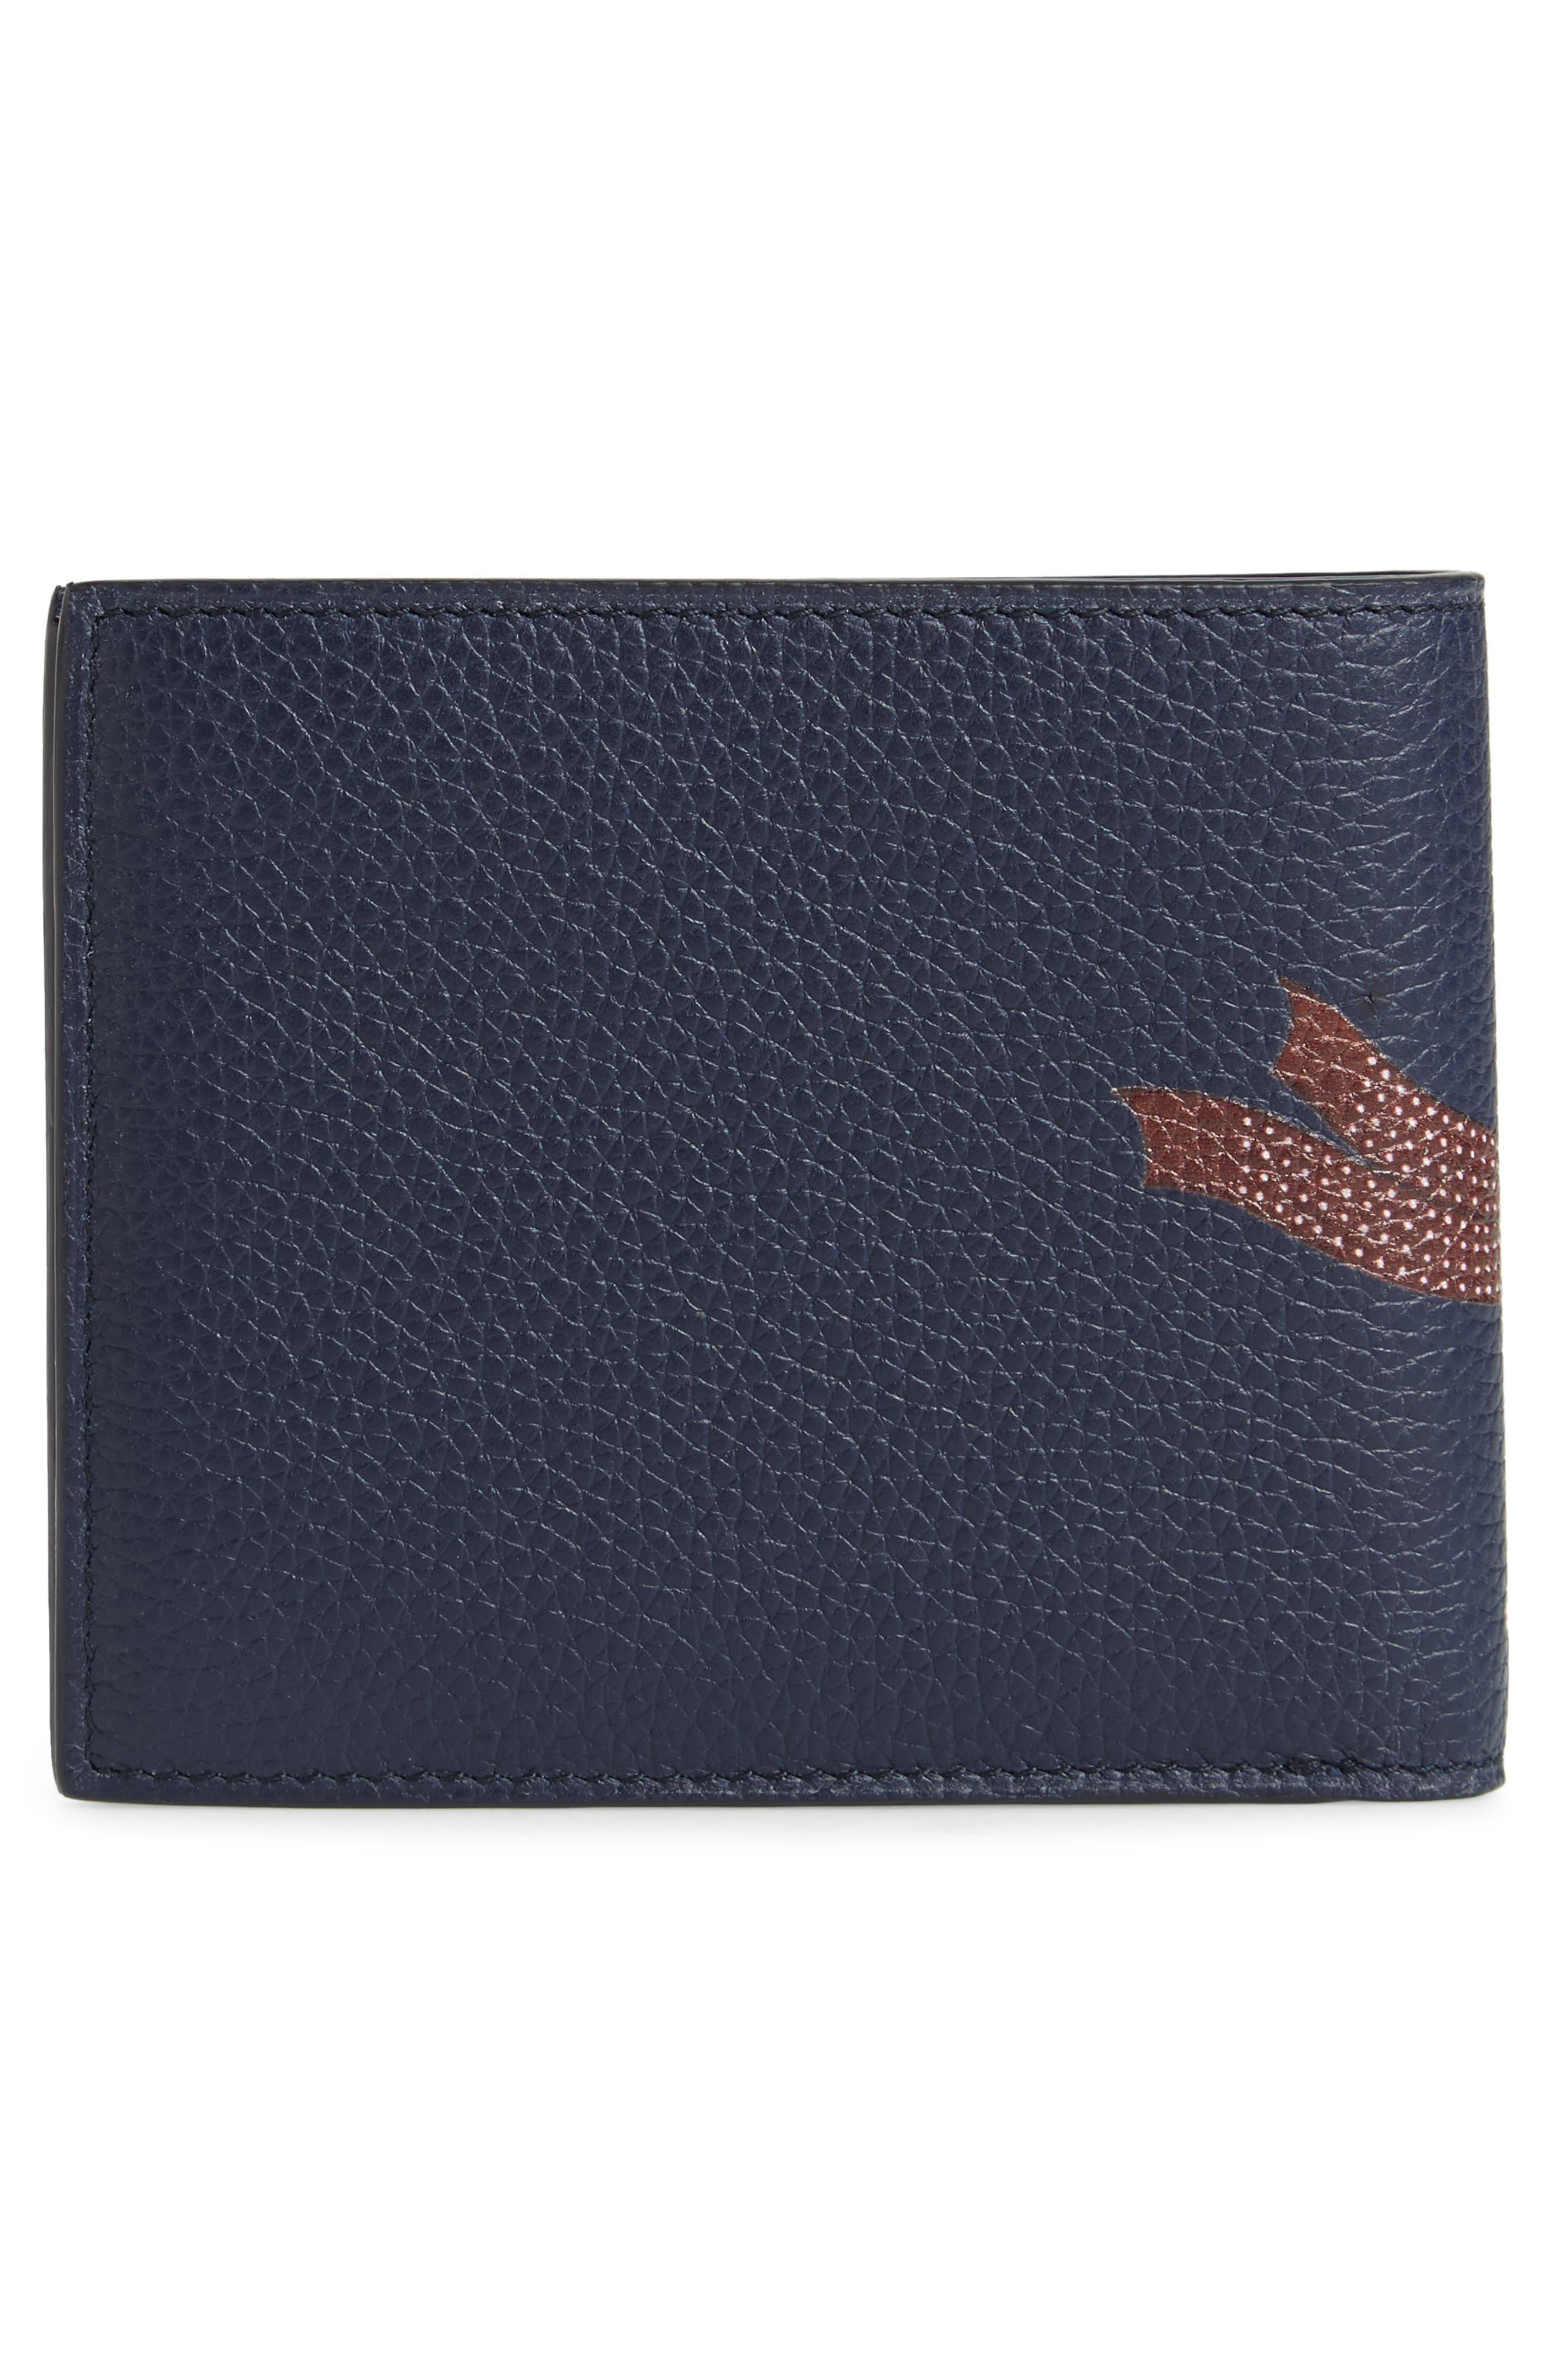 Boston Bulldog Leather Bifold Wallet,                             Alternate thumbnail 3, color,                             400